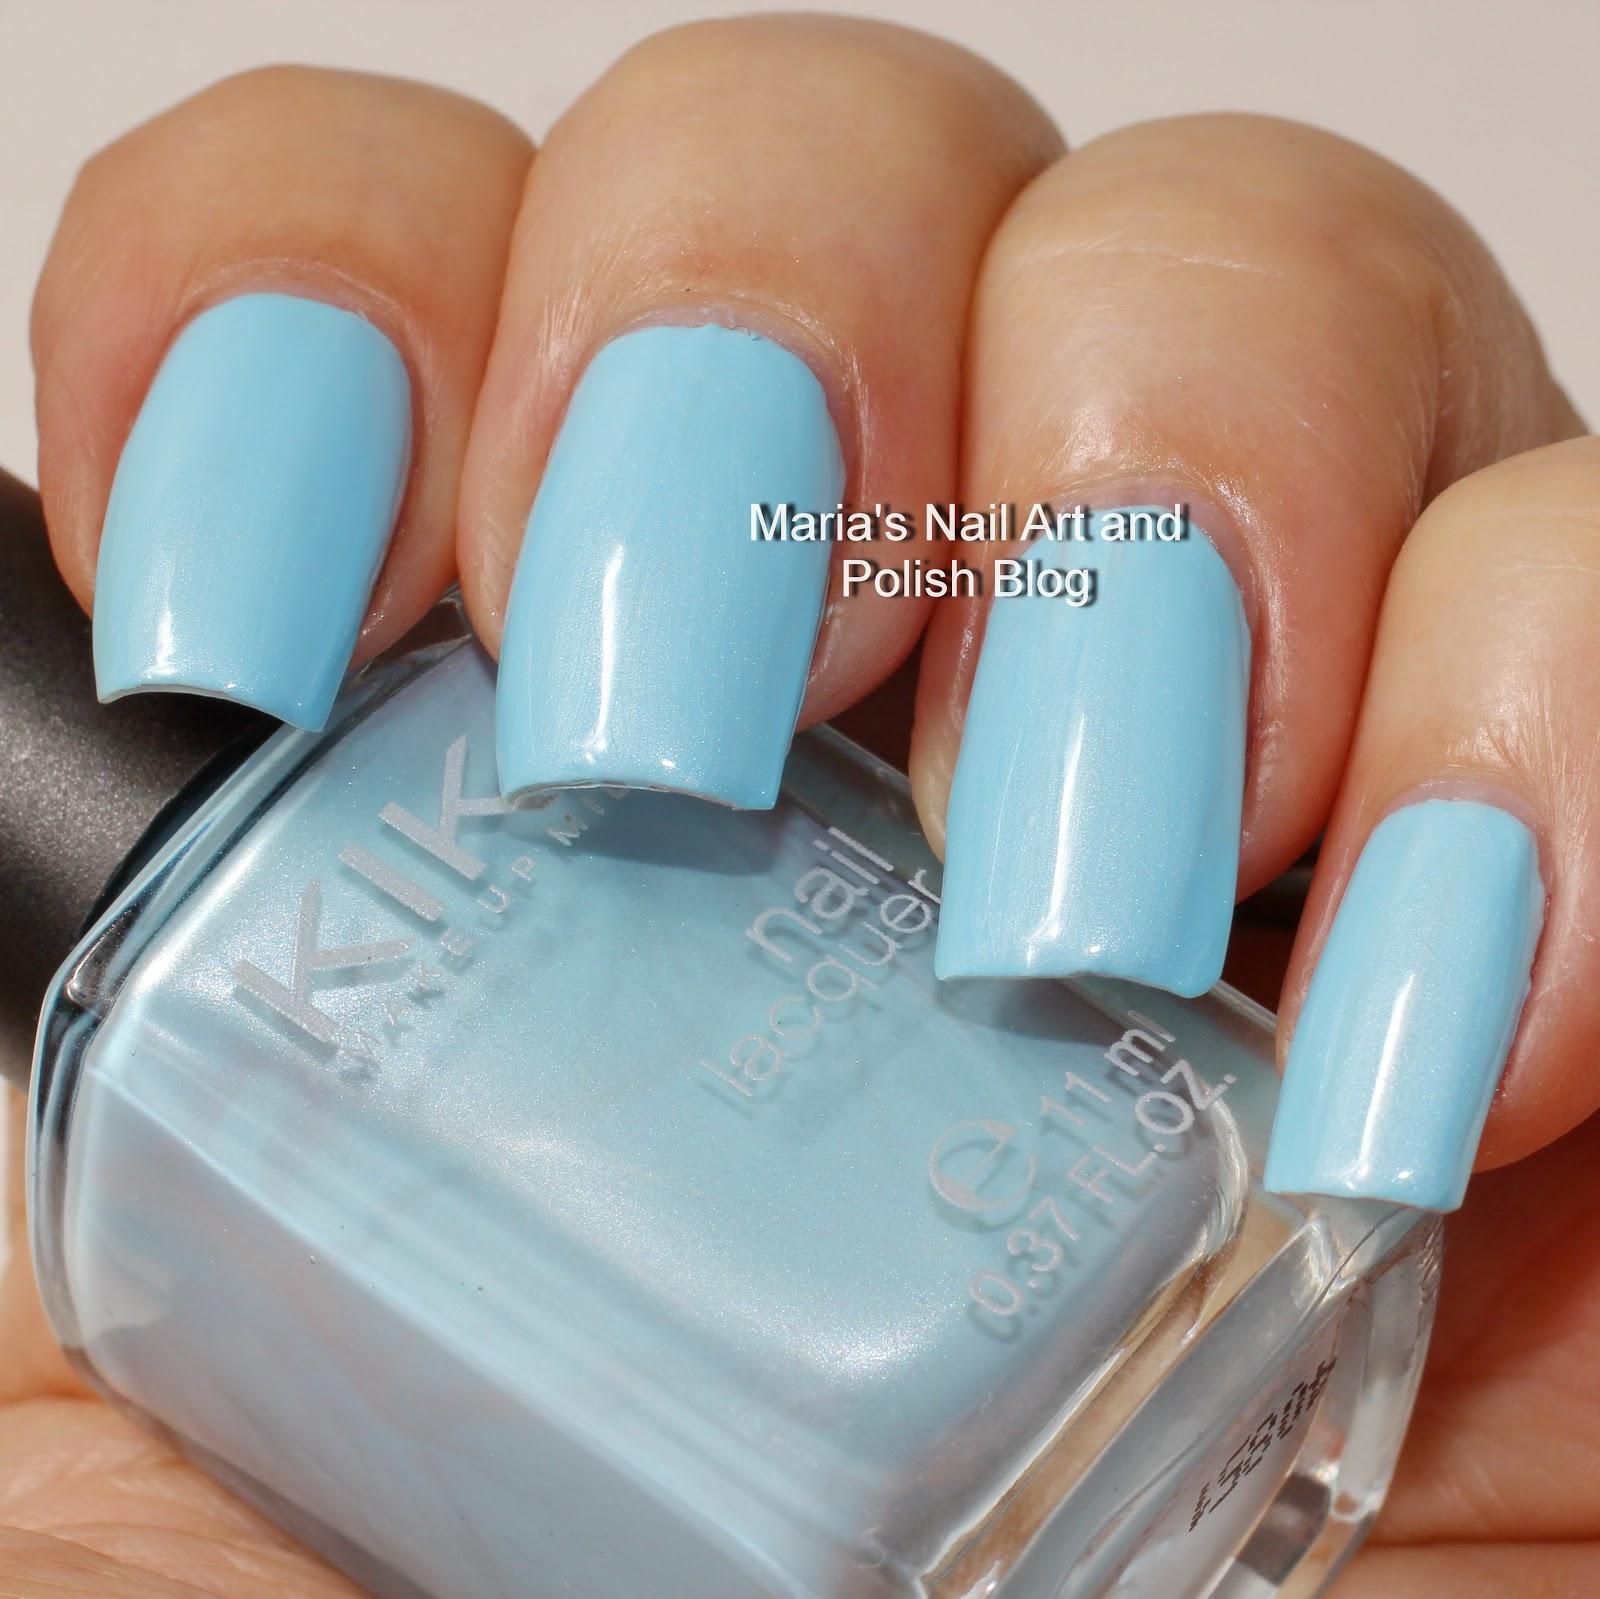 Marias Nail Art And Polish Blog: Kiko 525 Metallic Pastel